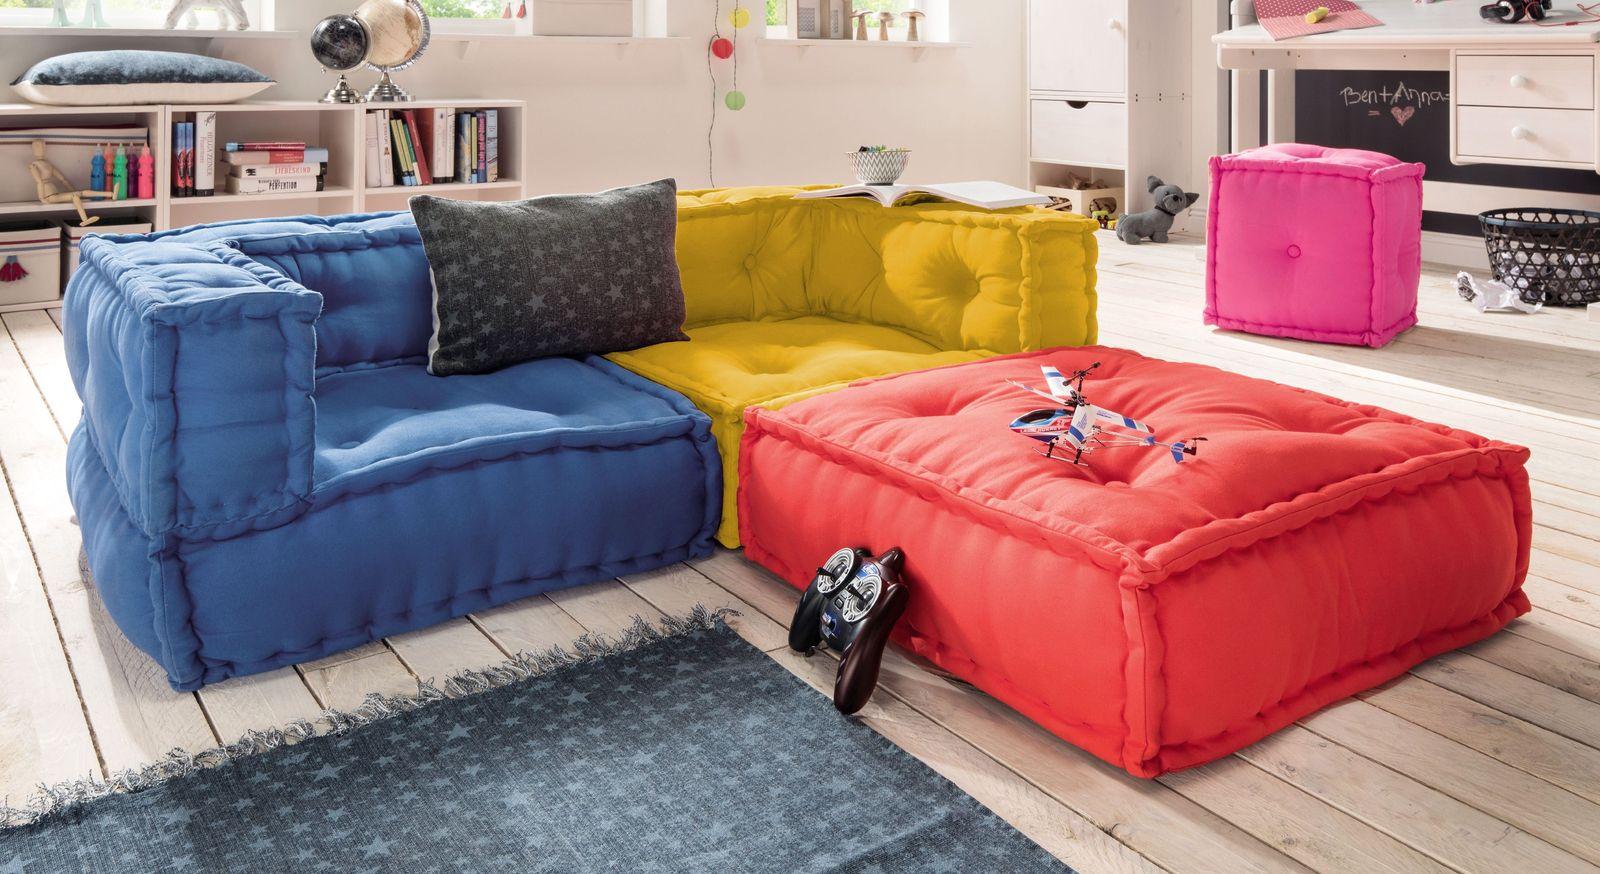 Sitzkissen-Sofa Kids Paradise als innovative Sofalandschaft